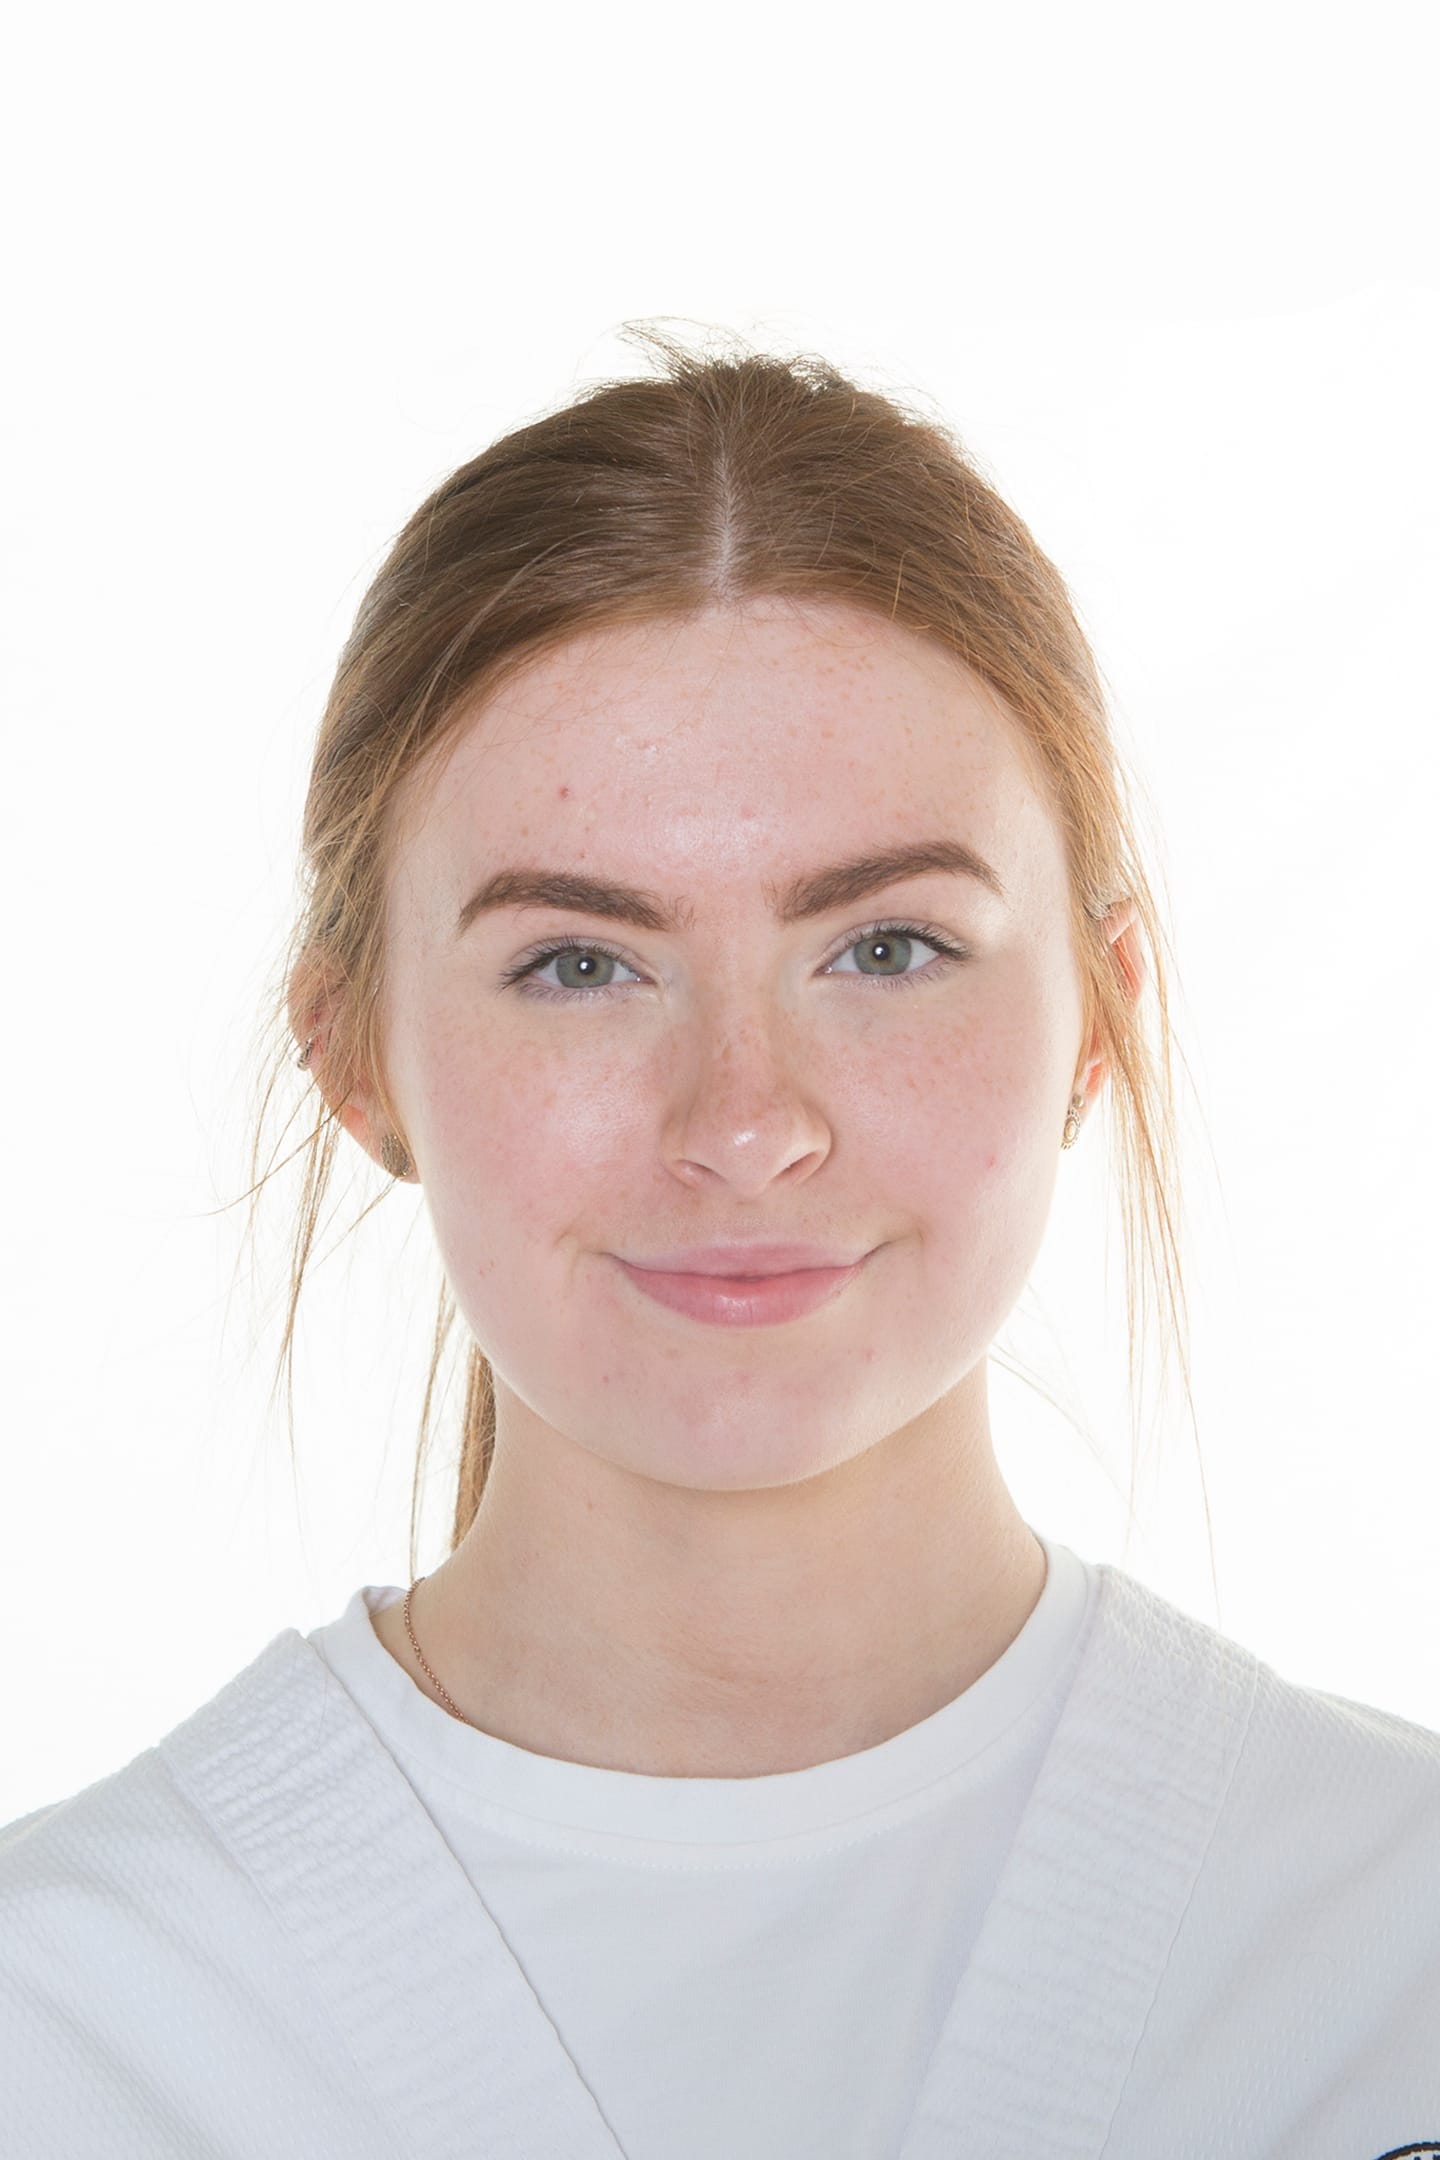 Clare Donnelly in Balbriggan - Elite Taekwondo Academy